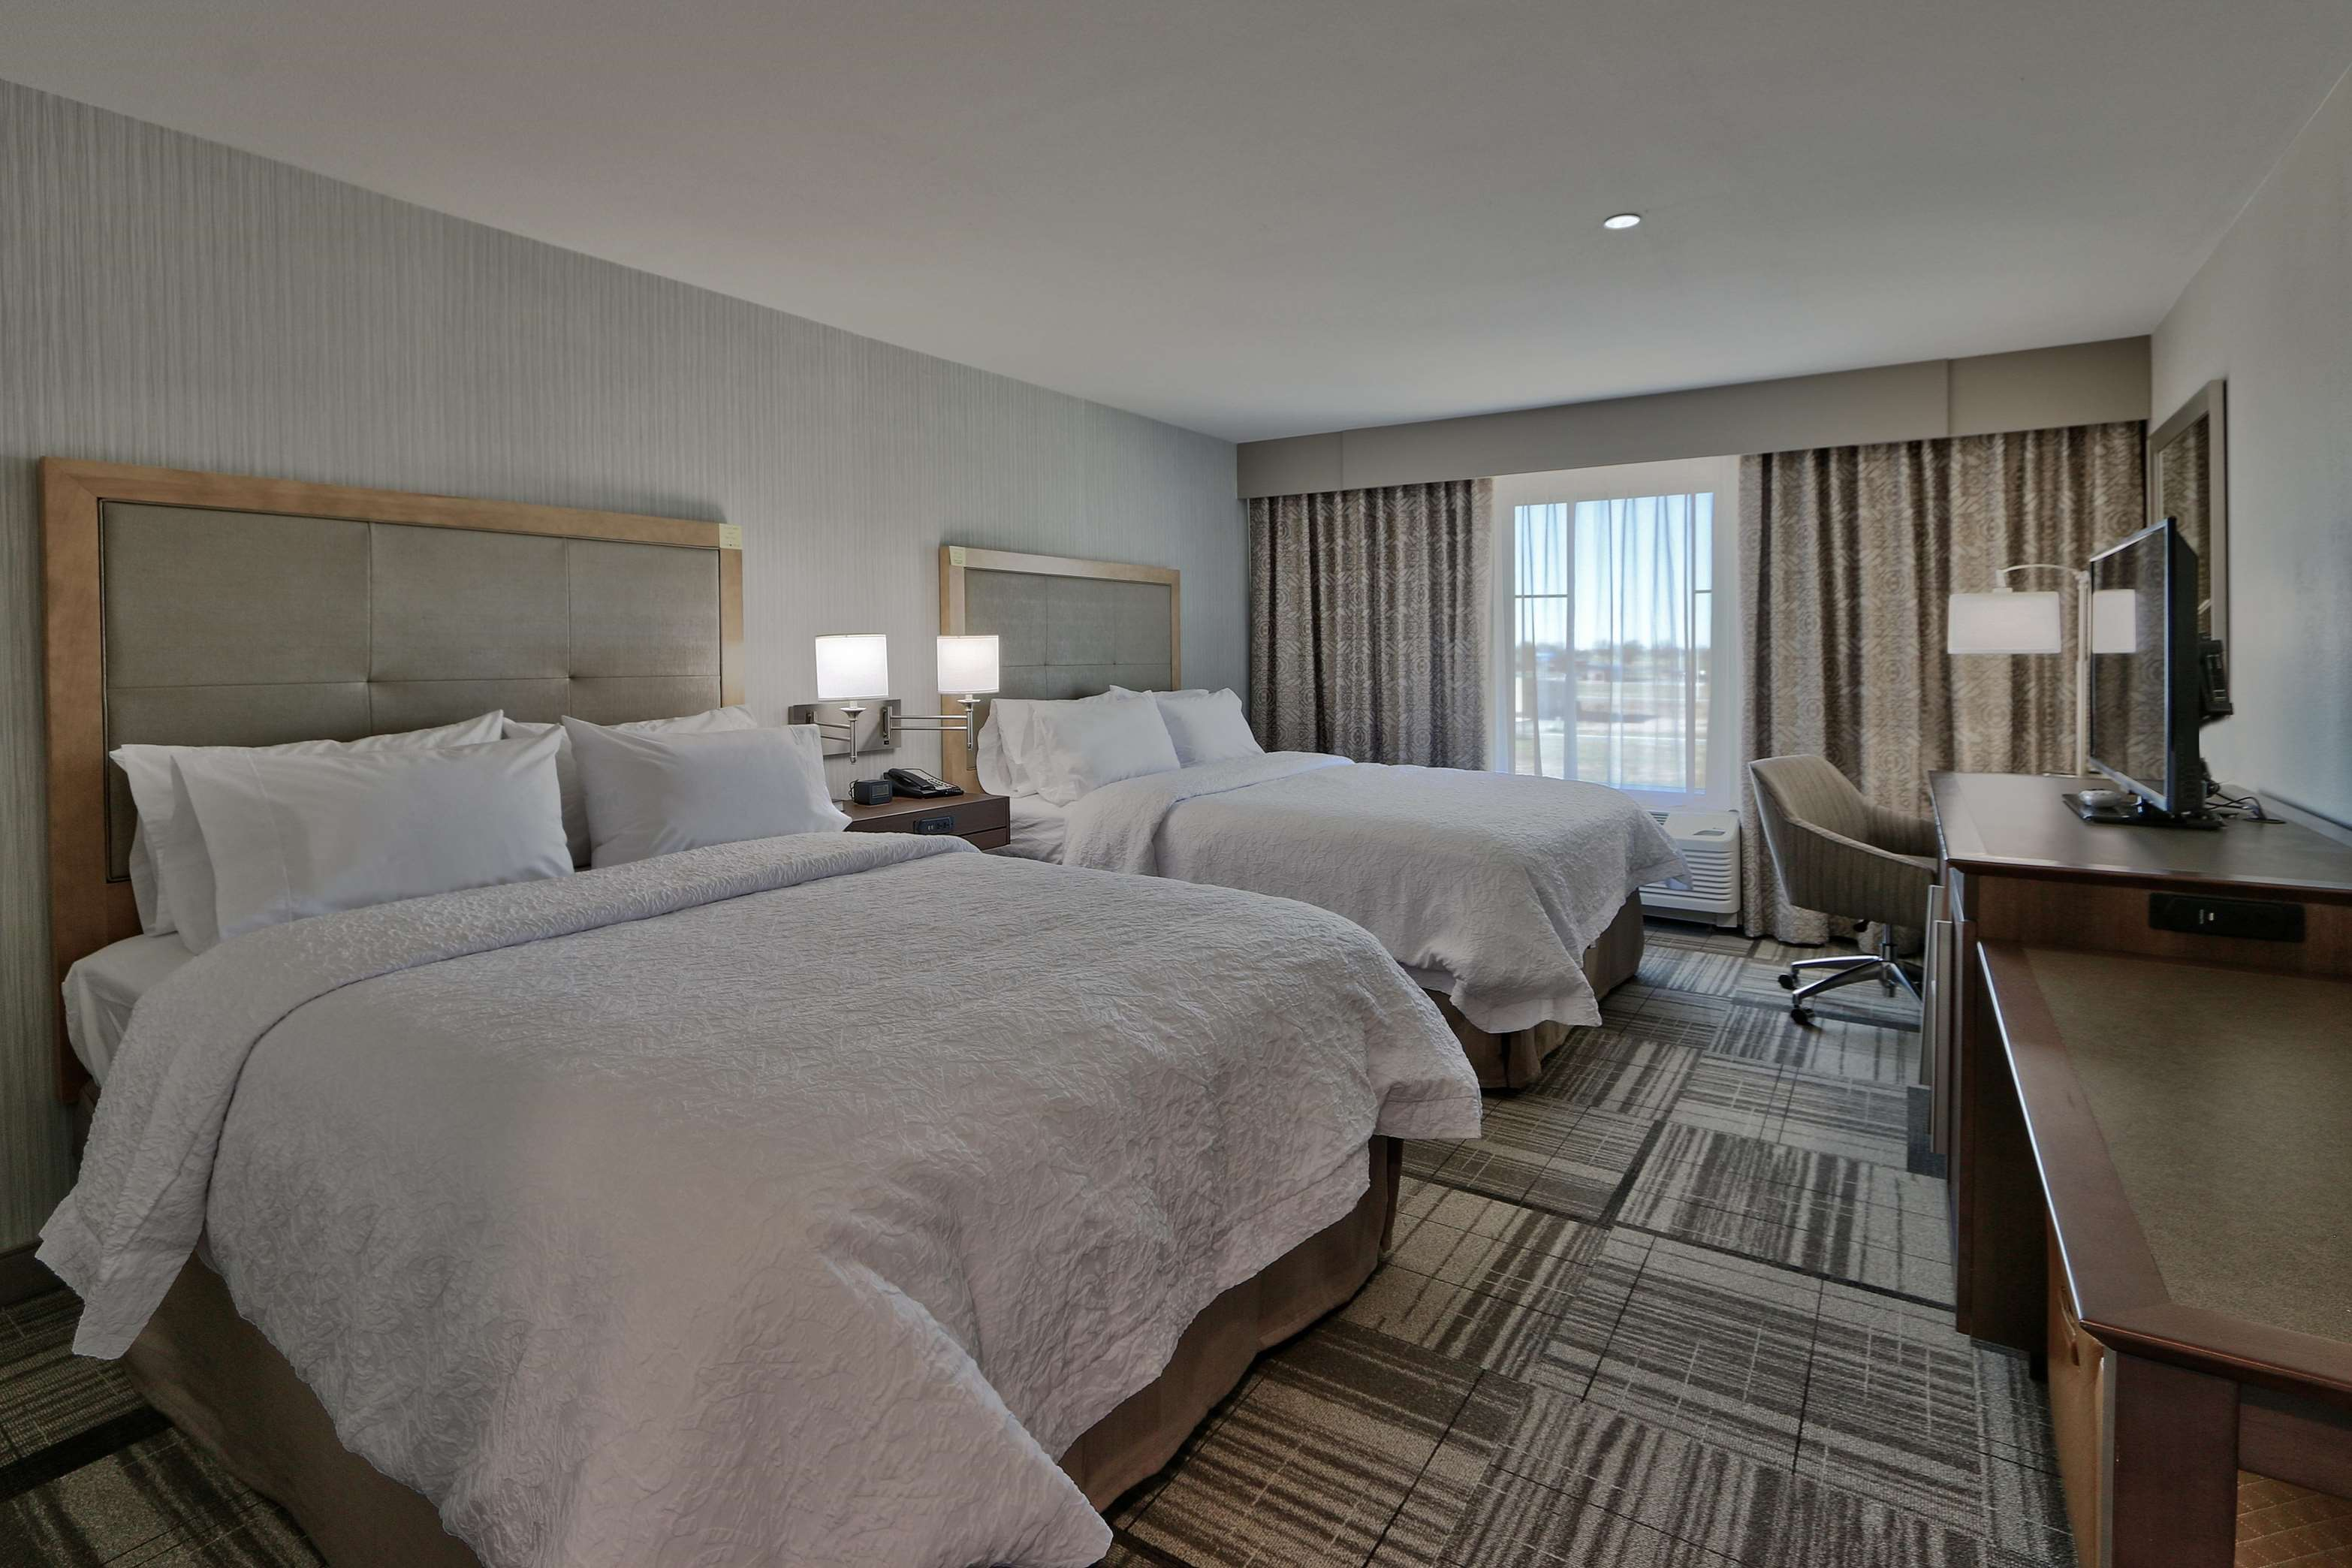 Hampton Inn & Suites Artesia image 23